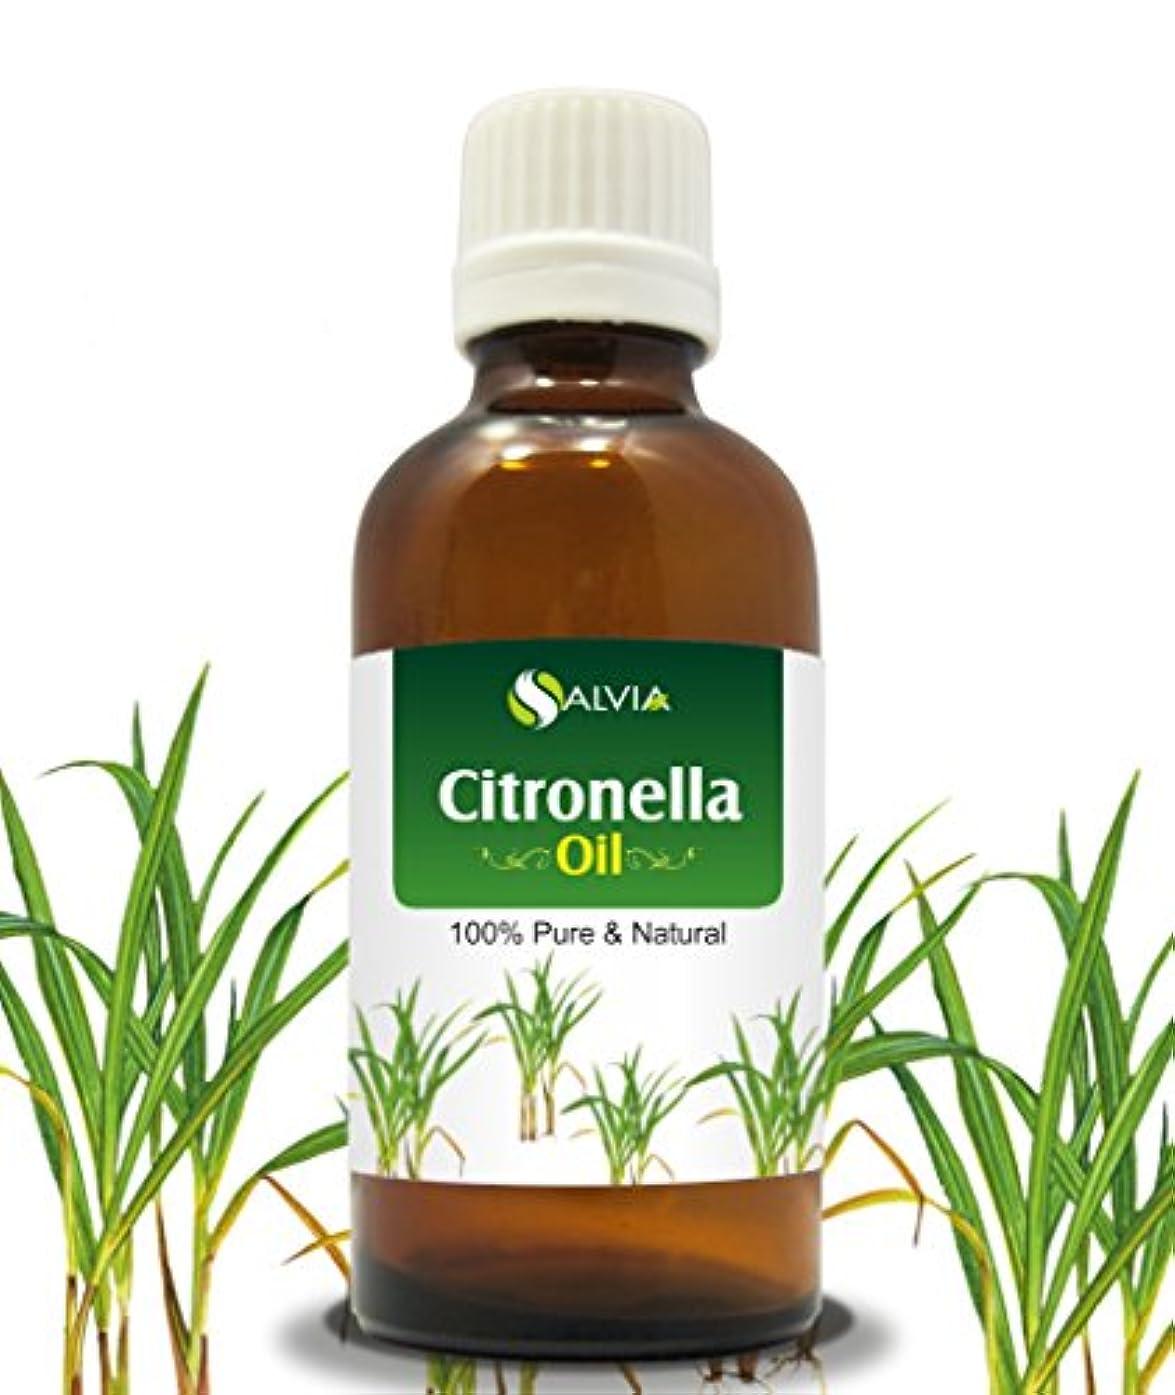 CITRONELLA OIL 100% NATURAL PURE UNDILUTED UNCUT ESSENTIAL OIL 30ML